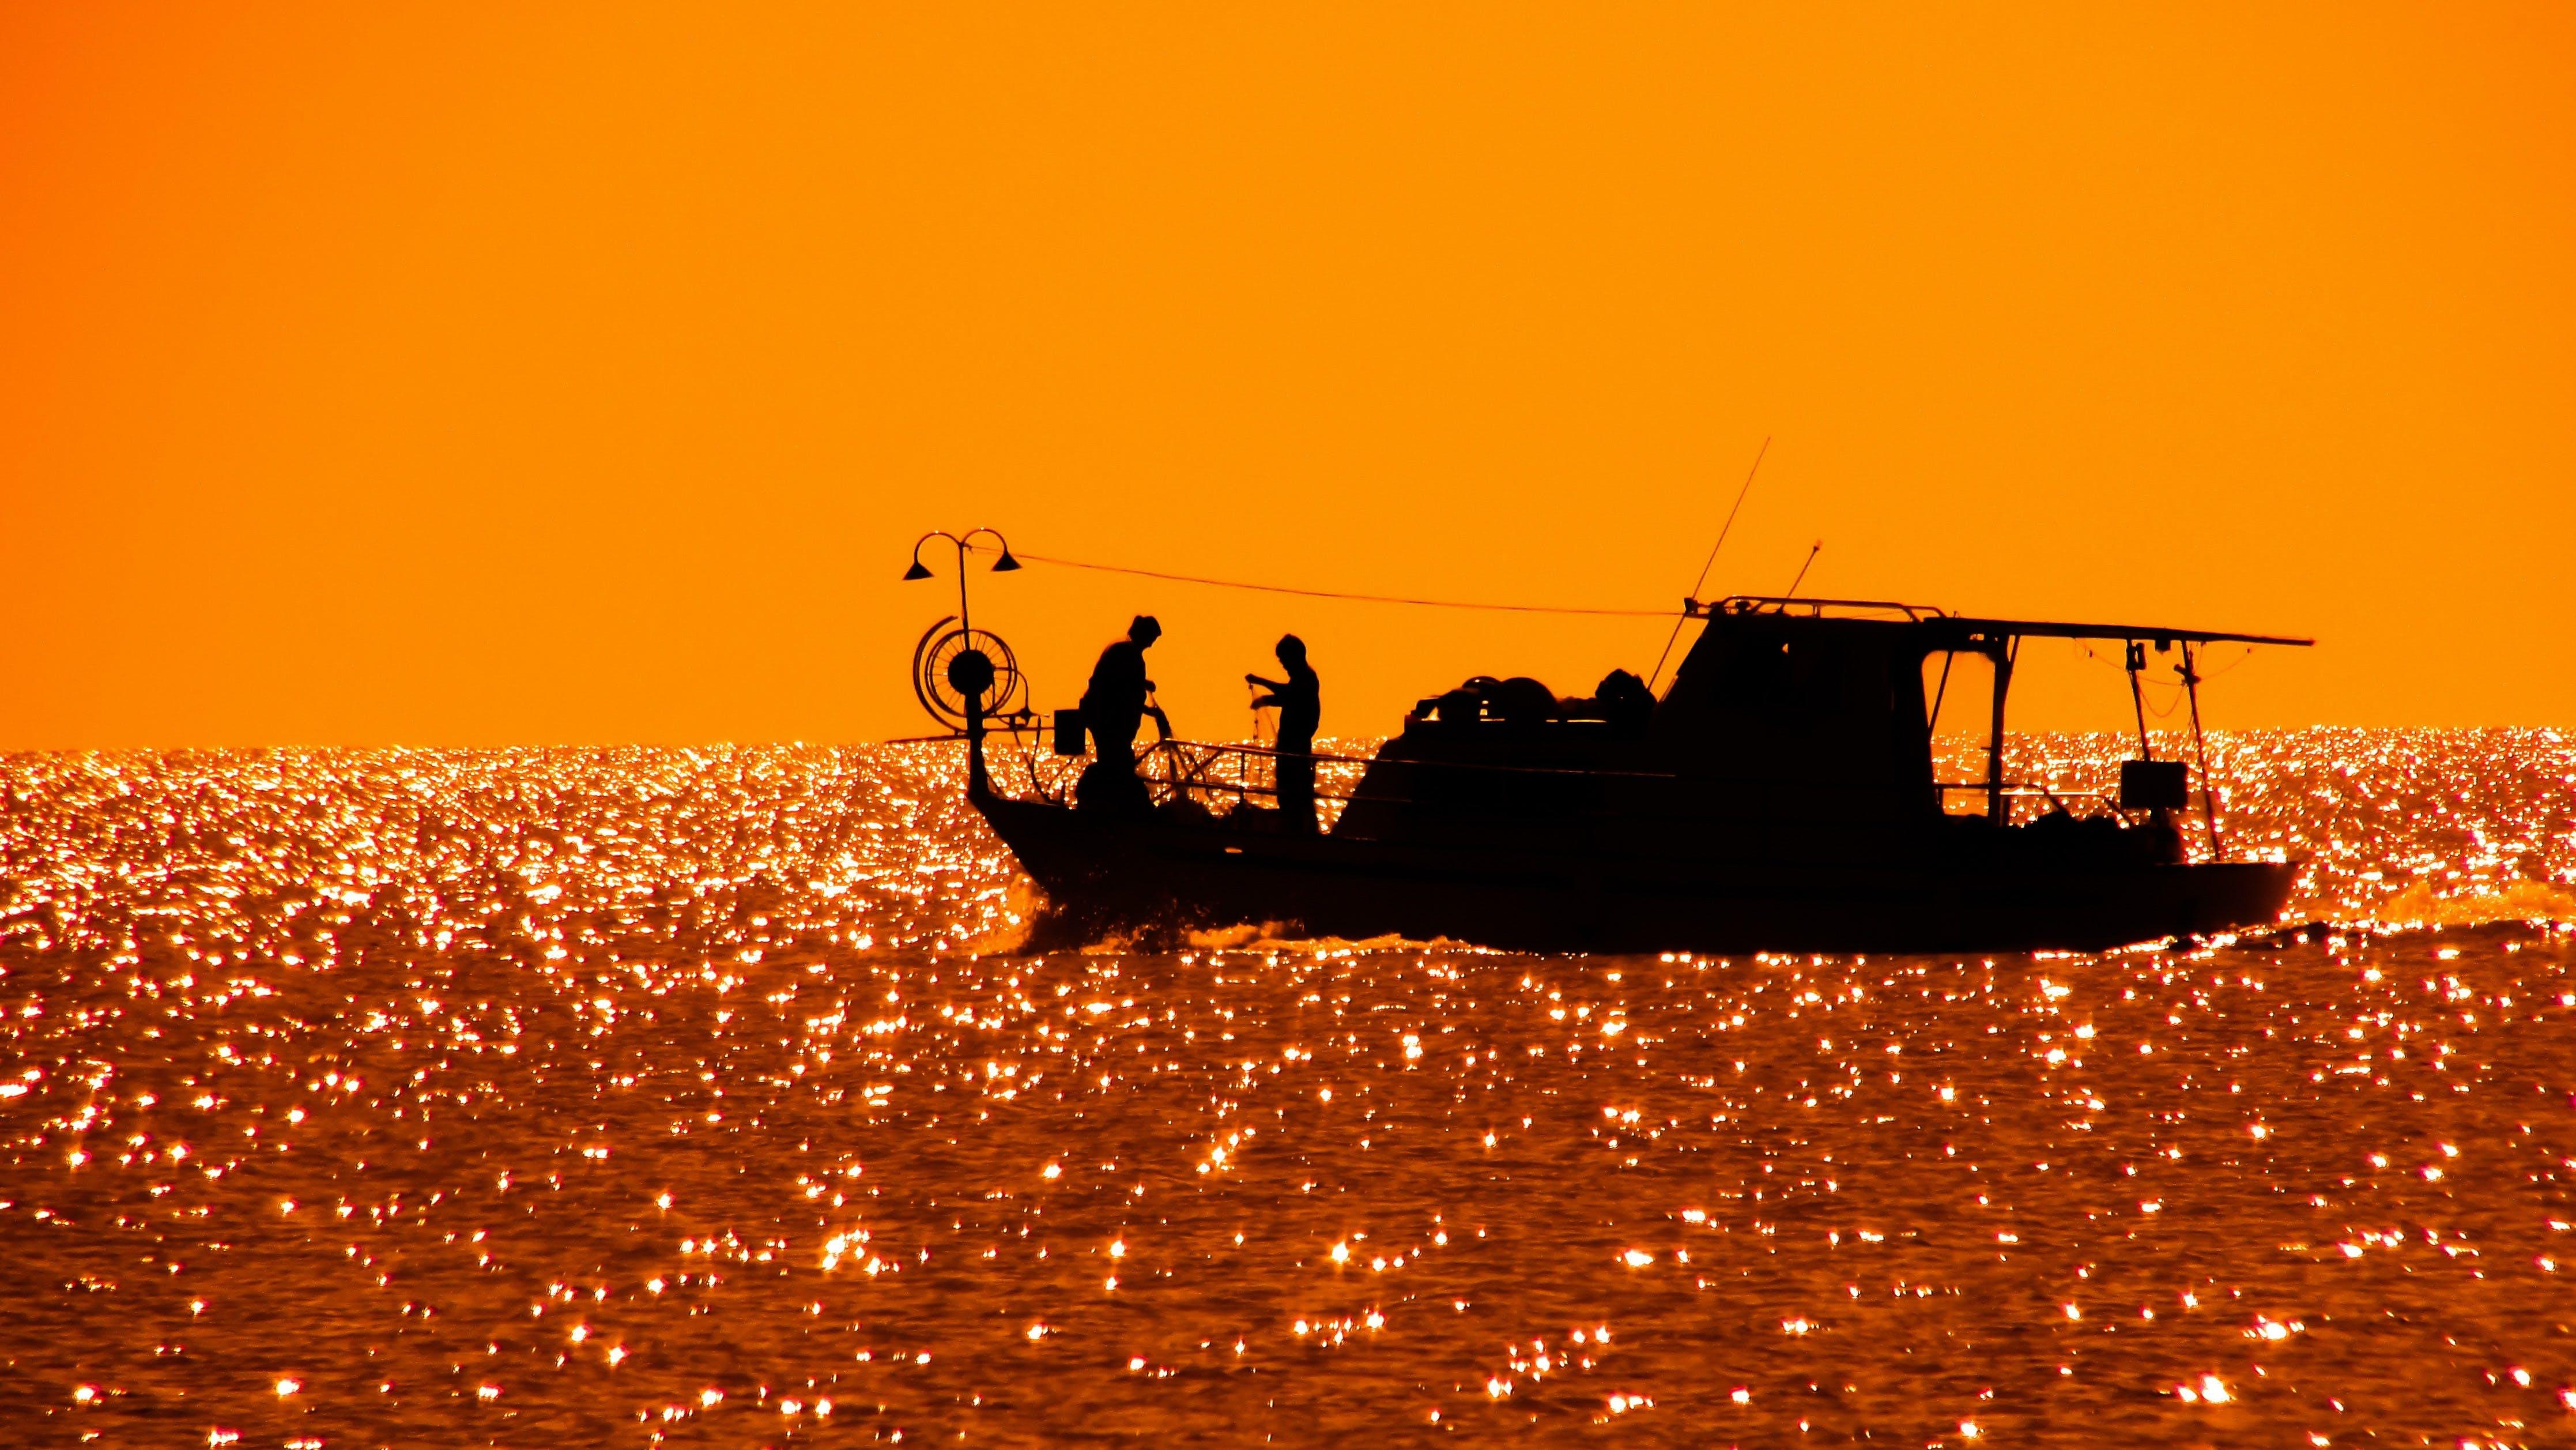 Fotos de stock gratuitas de agua, amanecer, barca, barco de pesca